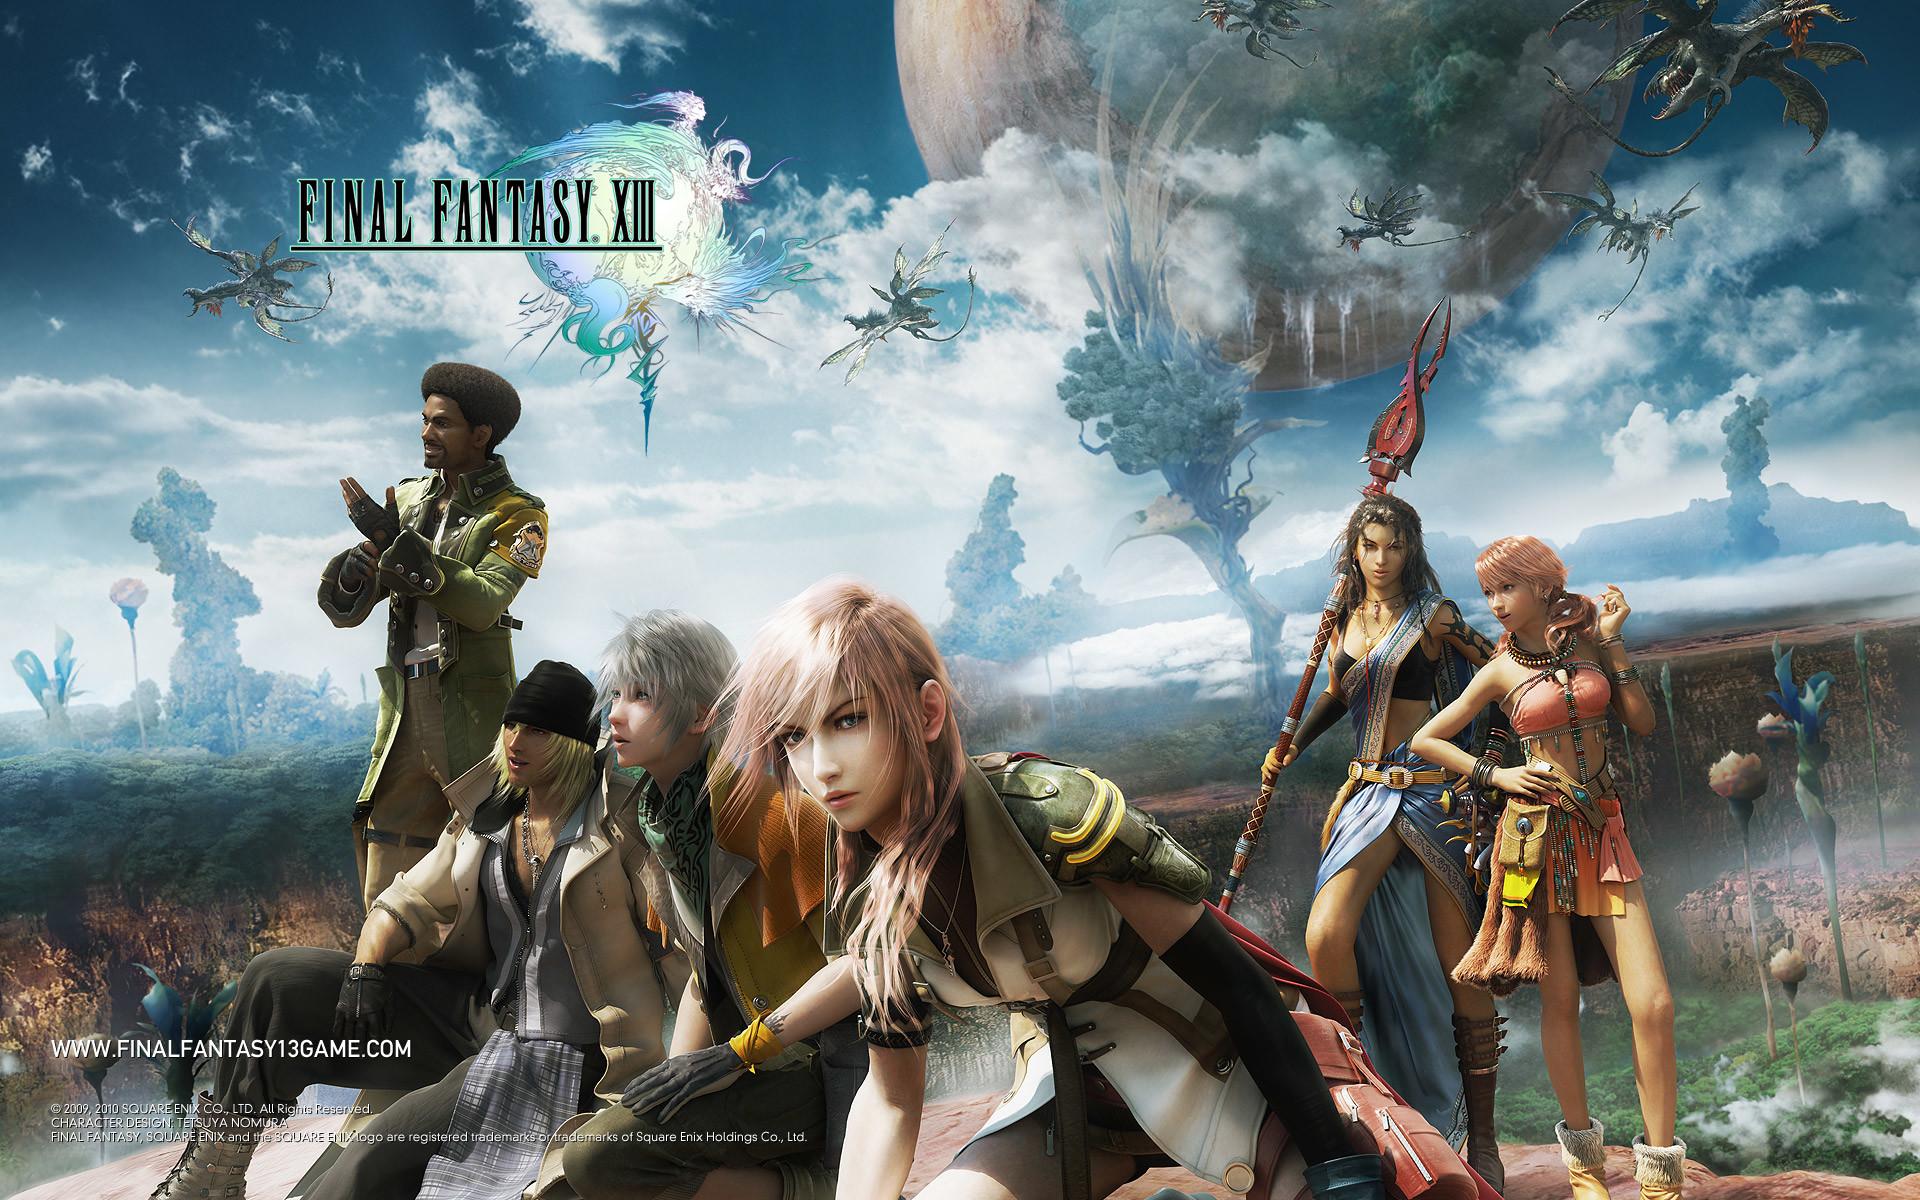 Final Fantasy 13 Wallpaper, Full HD 1080p Wallpaper, HD, Widescreen .